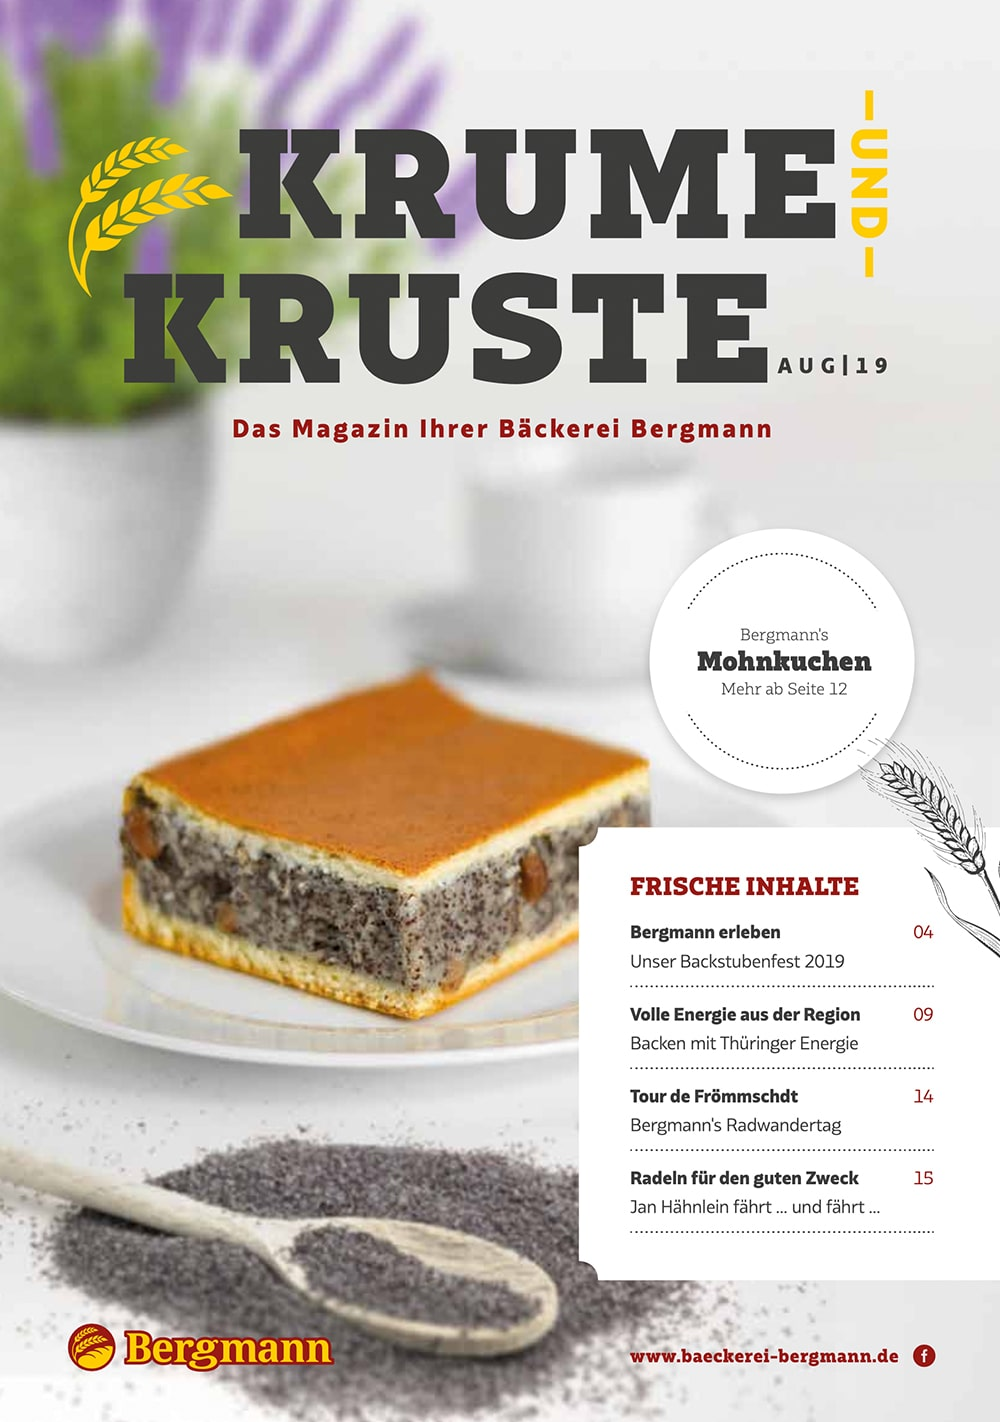 Krume & Kruste - August 2019